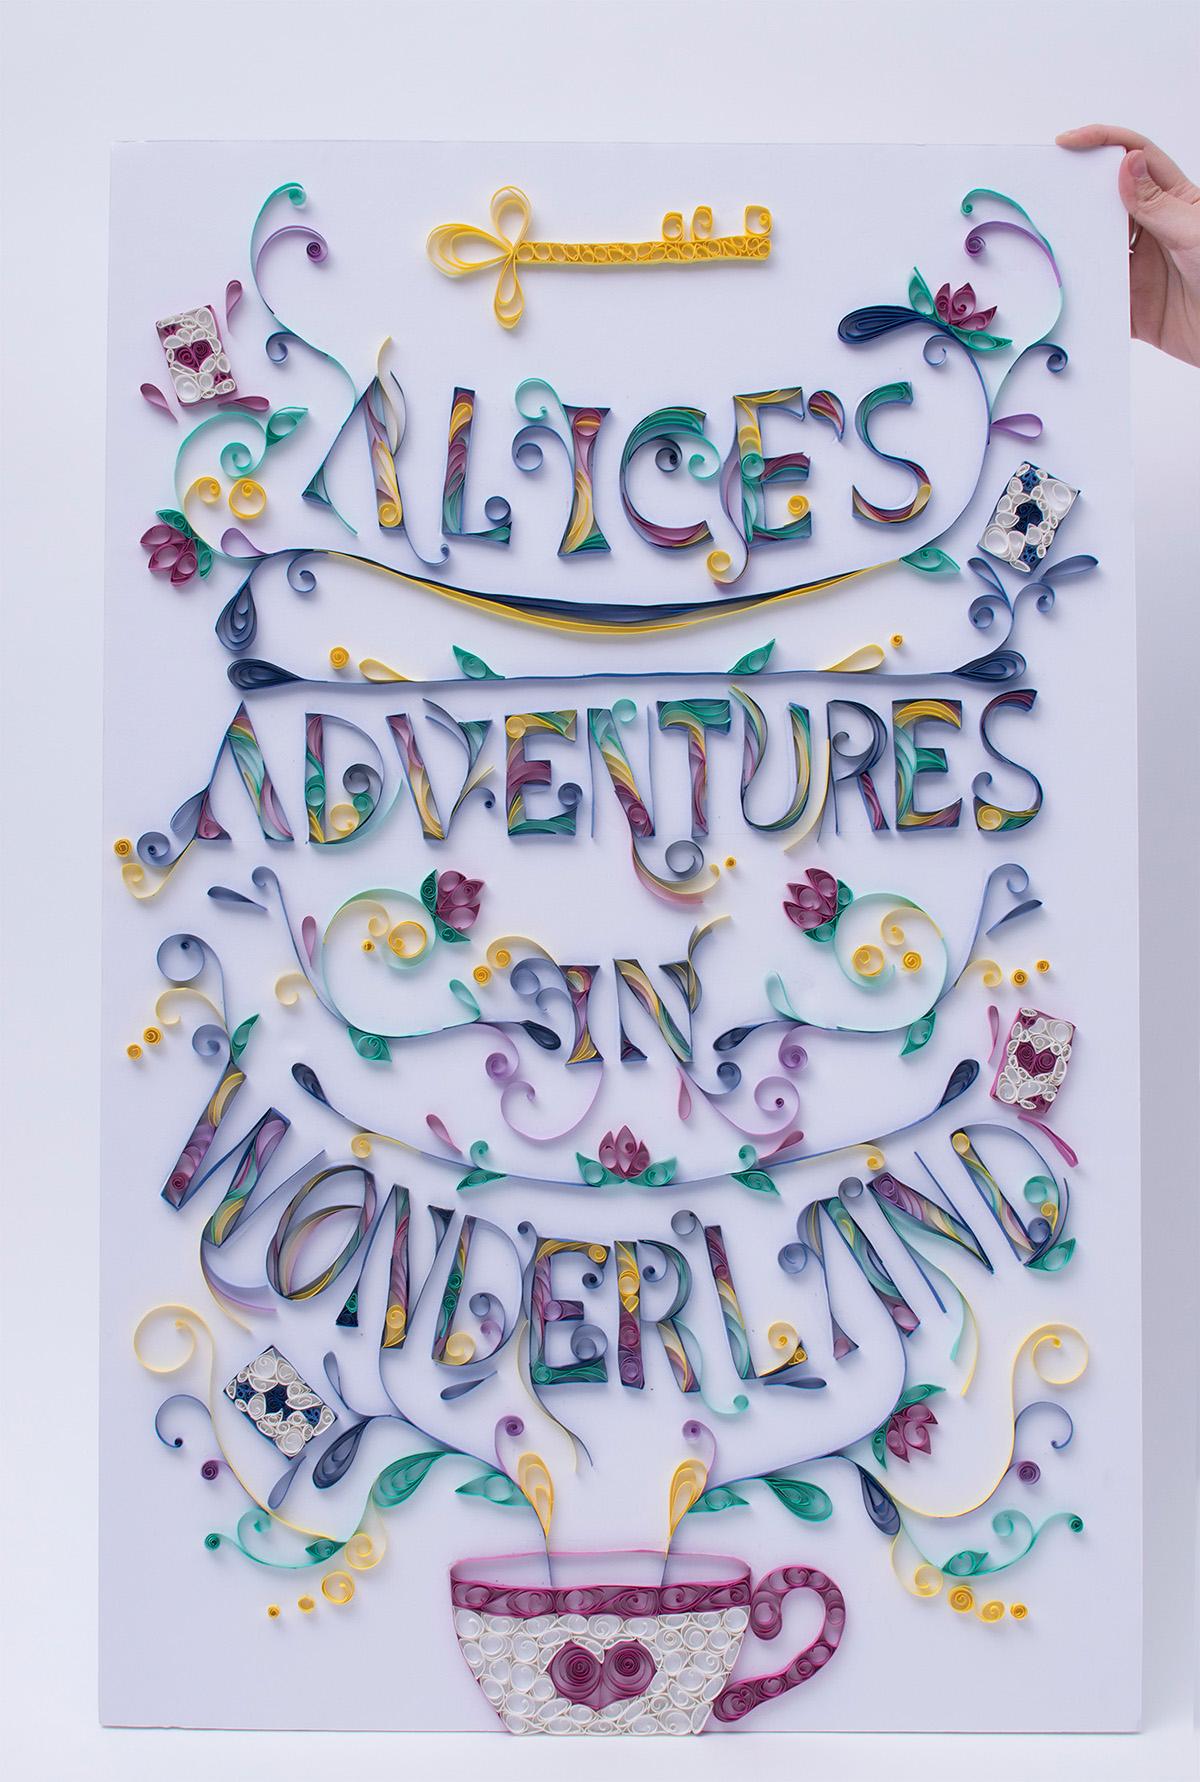 Alice In Wonderland Book Report Ideas : Alice s adventures in wonderland book cover design on